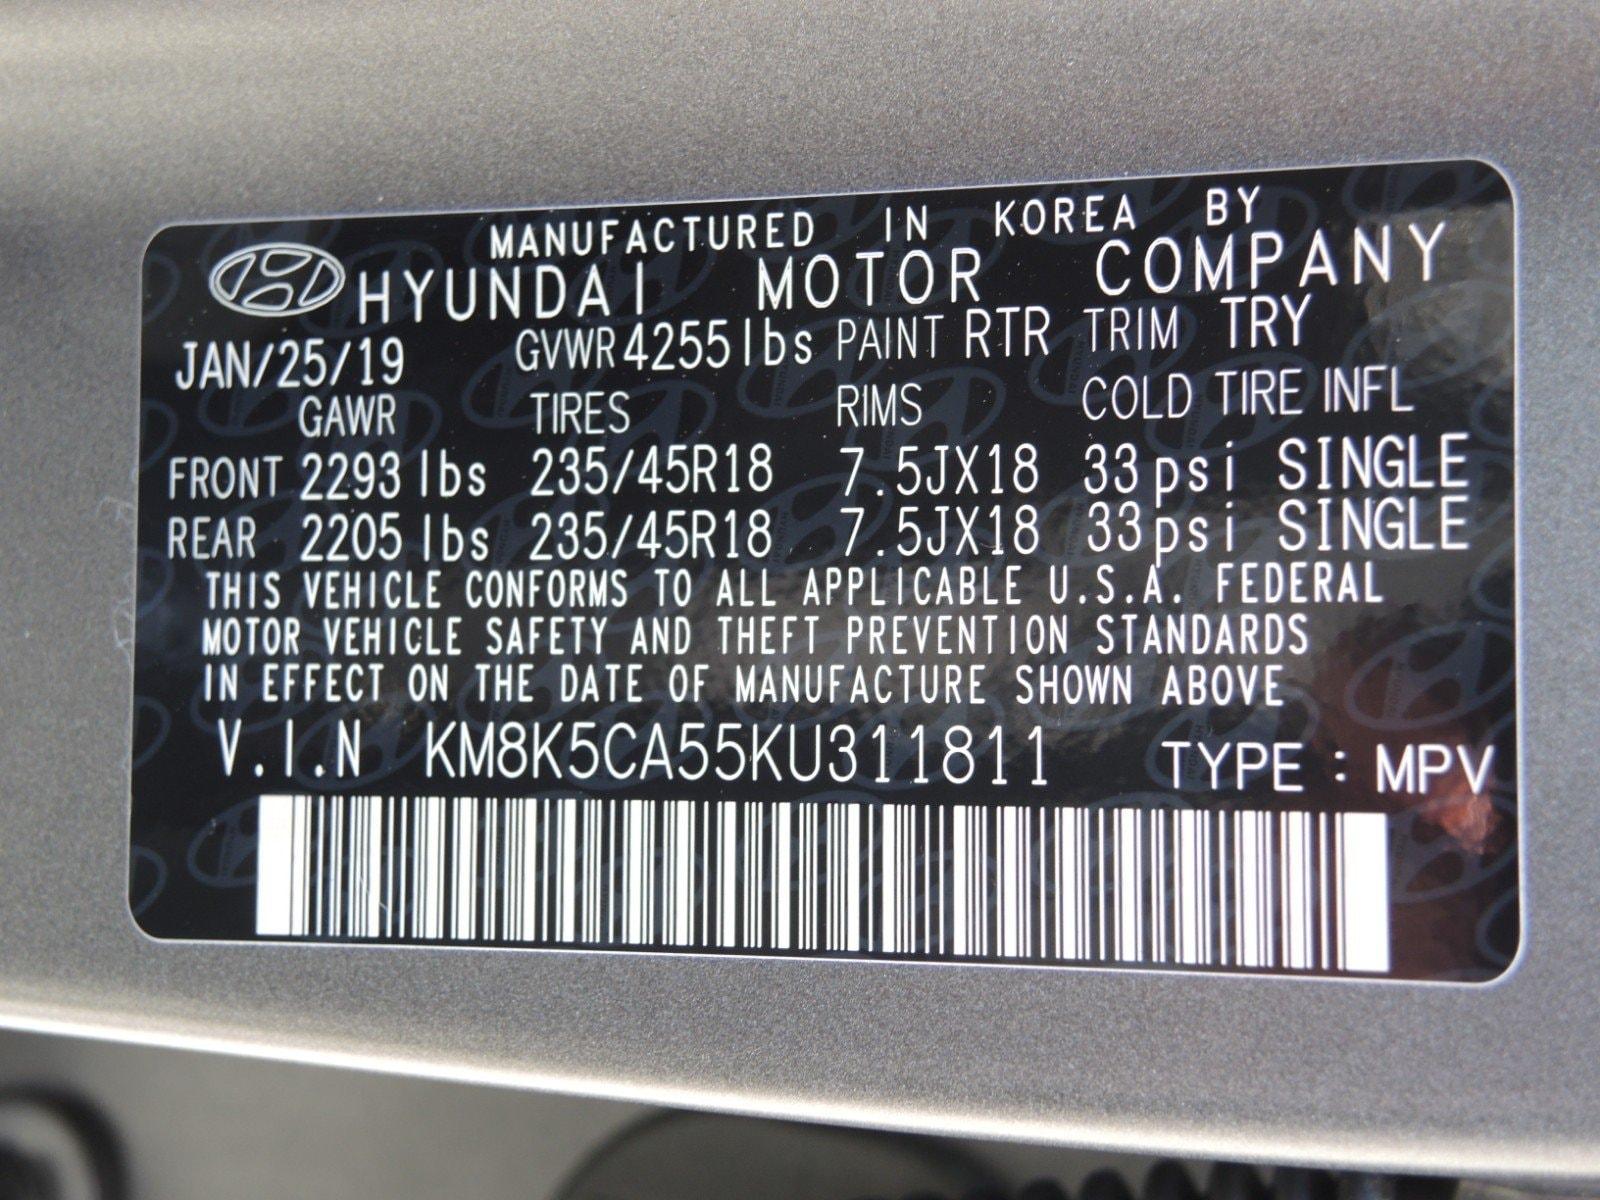 New 2019 Hyundai Kona For Sale New London CT   VIN:KM8K5CA55KU311811